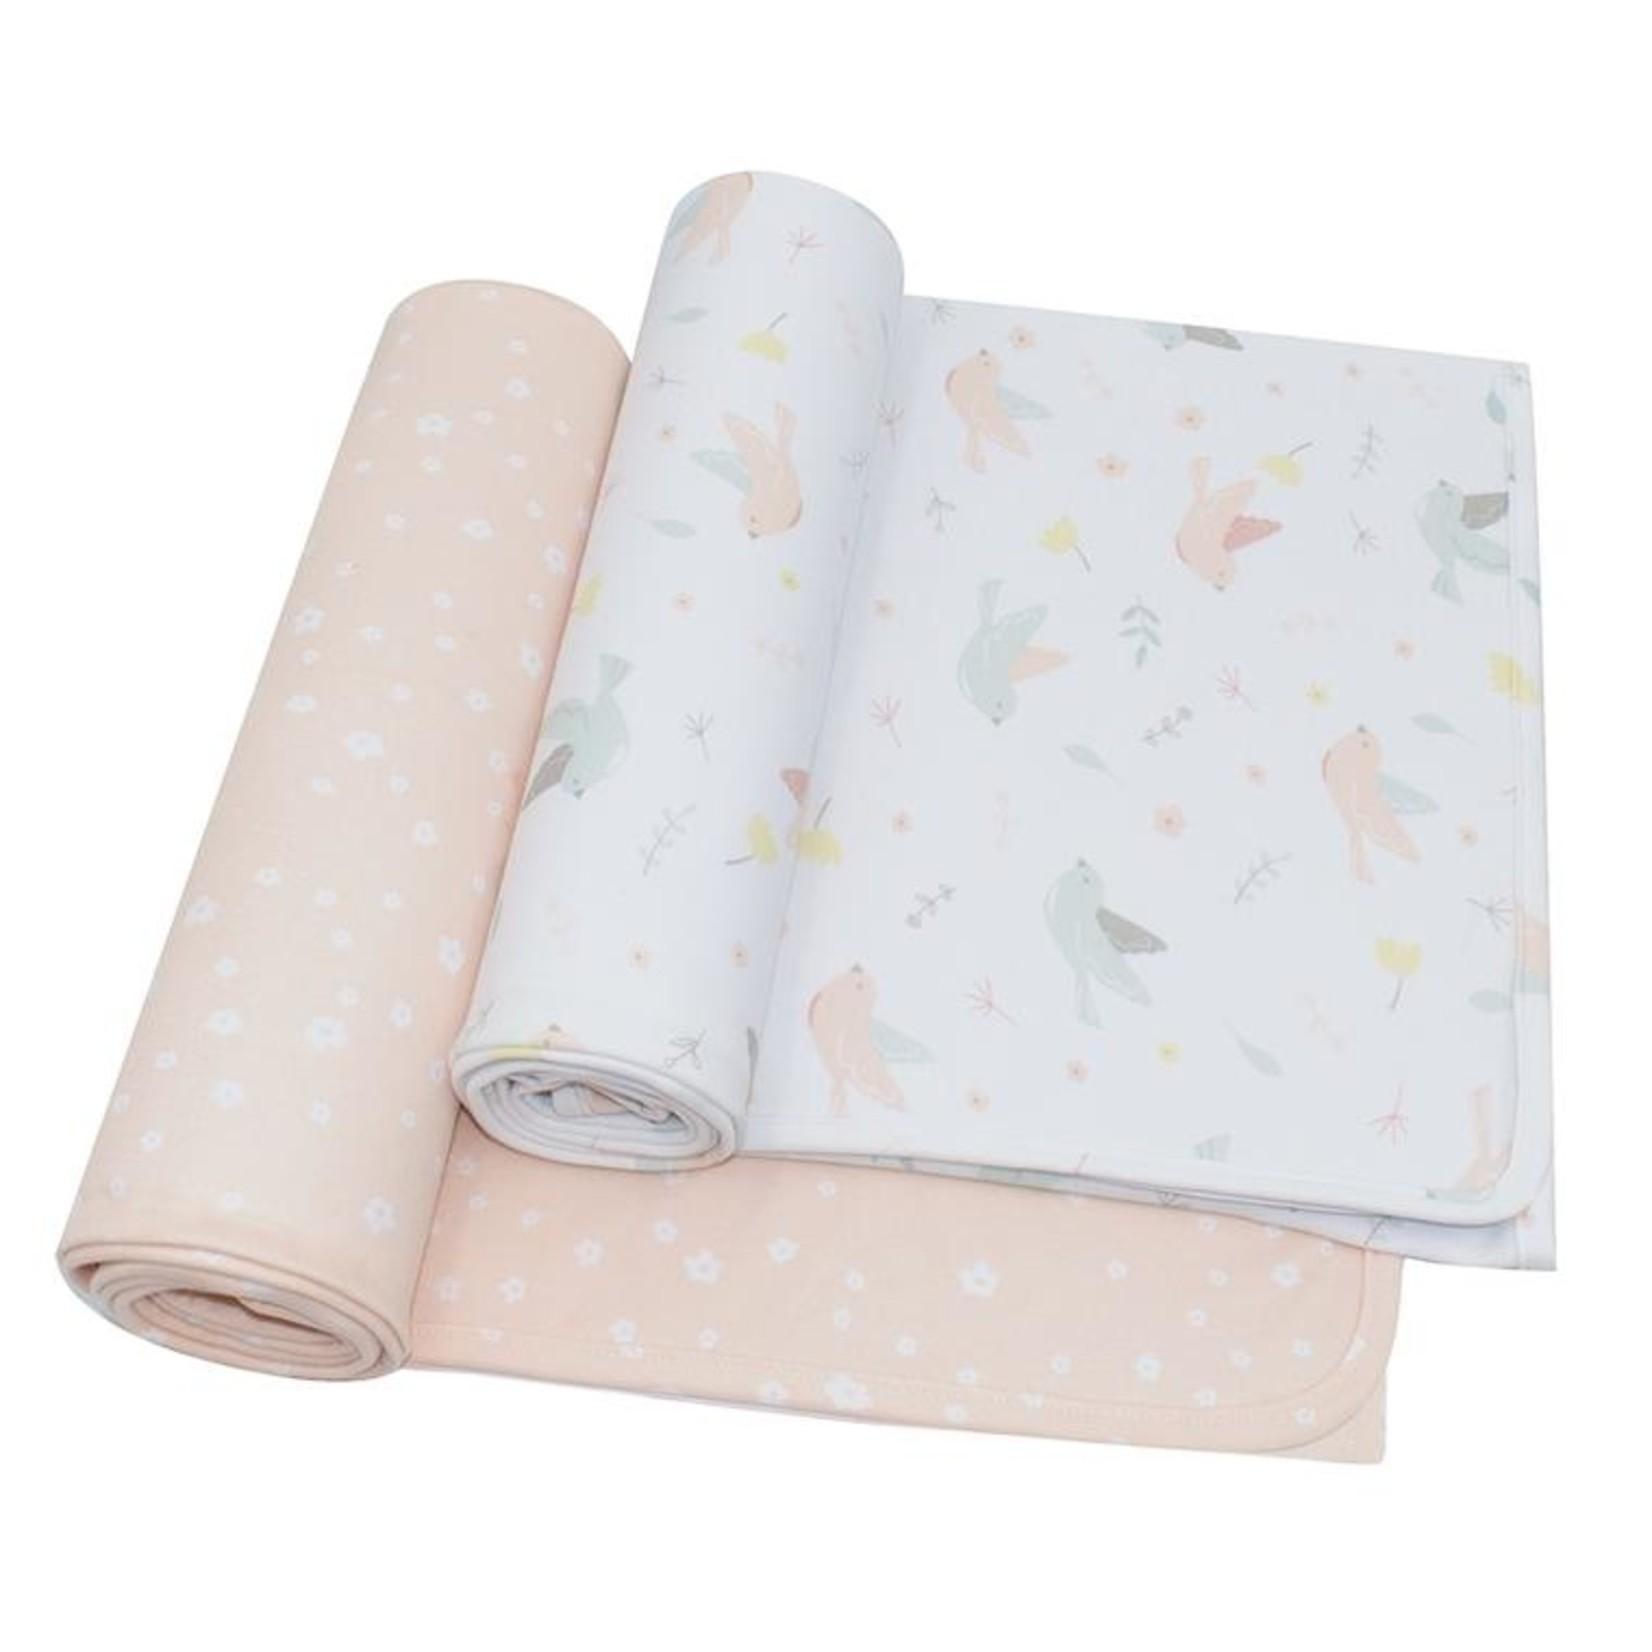 Living Textiles Living Textiles Jersey Wraps 2 Pack  - Ava/Blush Floral